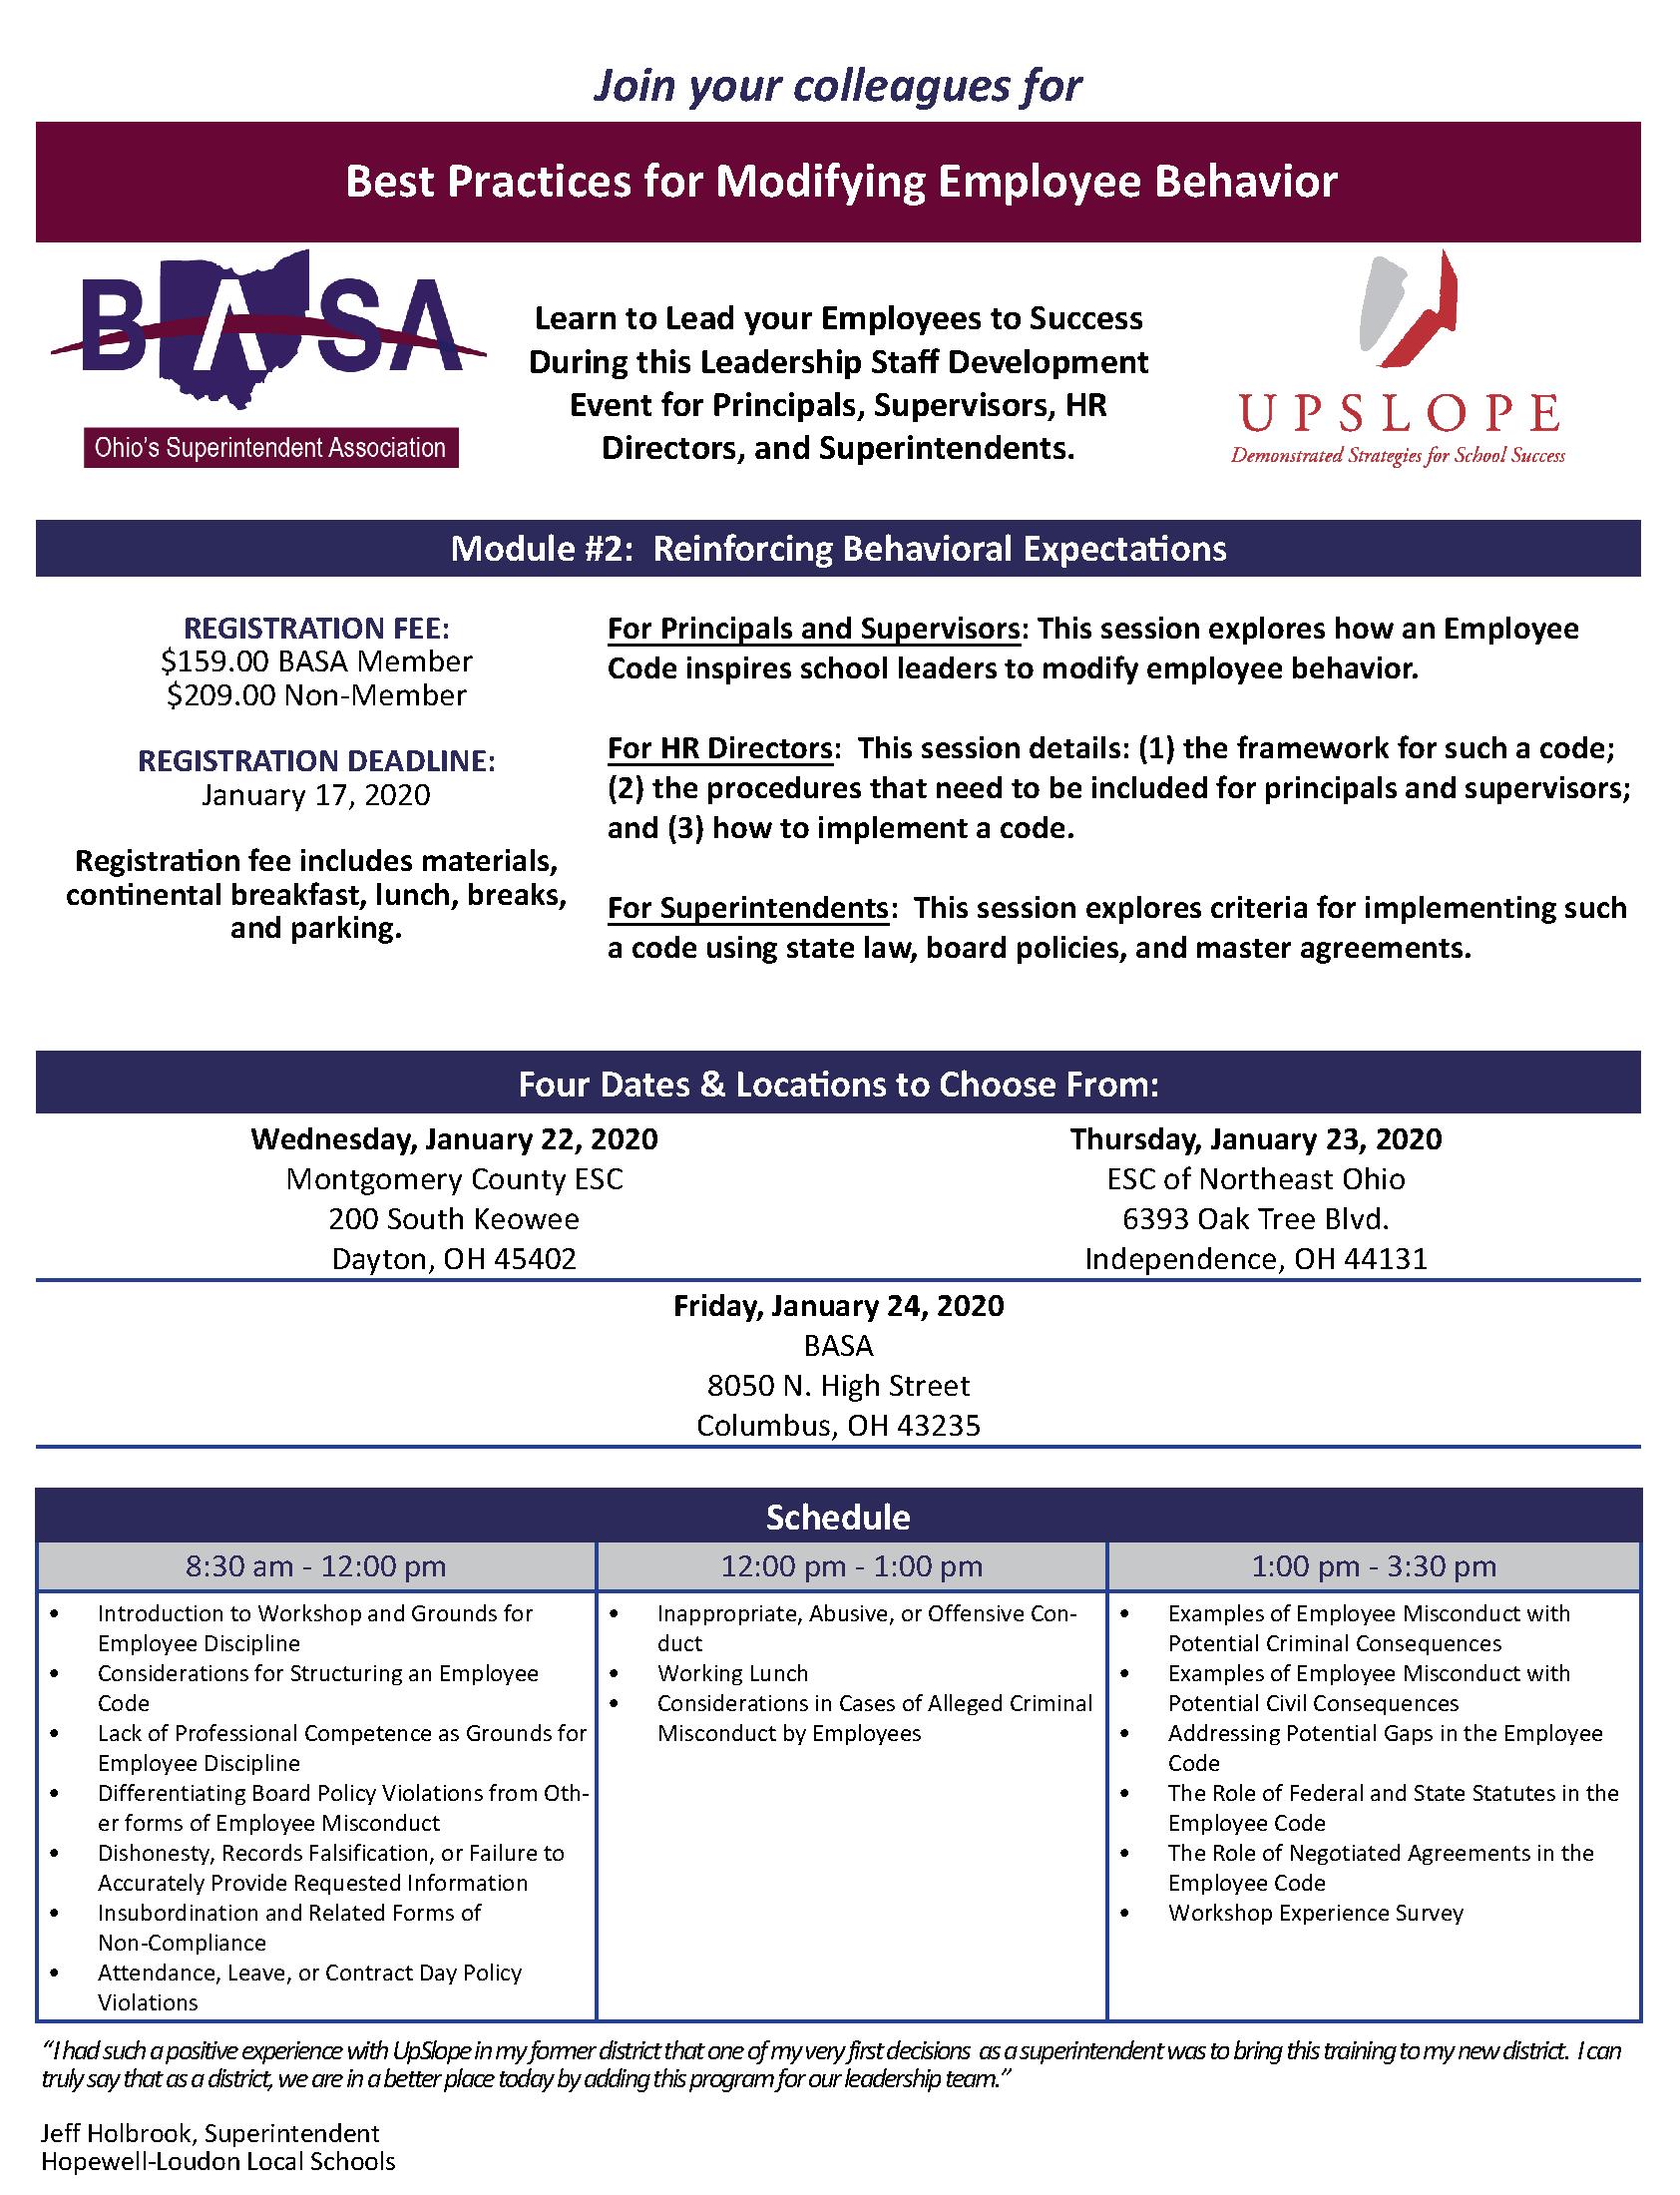 Best Practices for Modifying Employee Behavior @ BASA